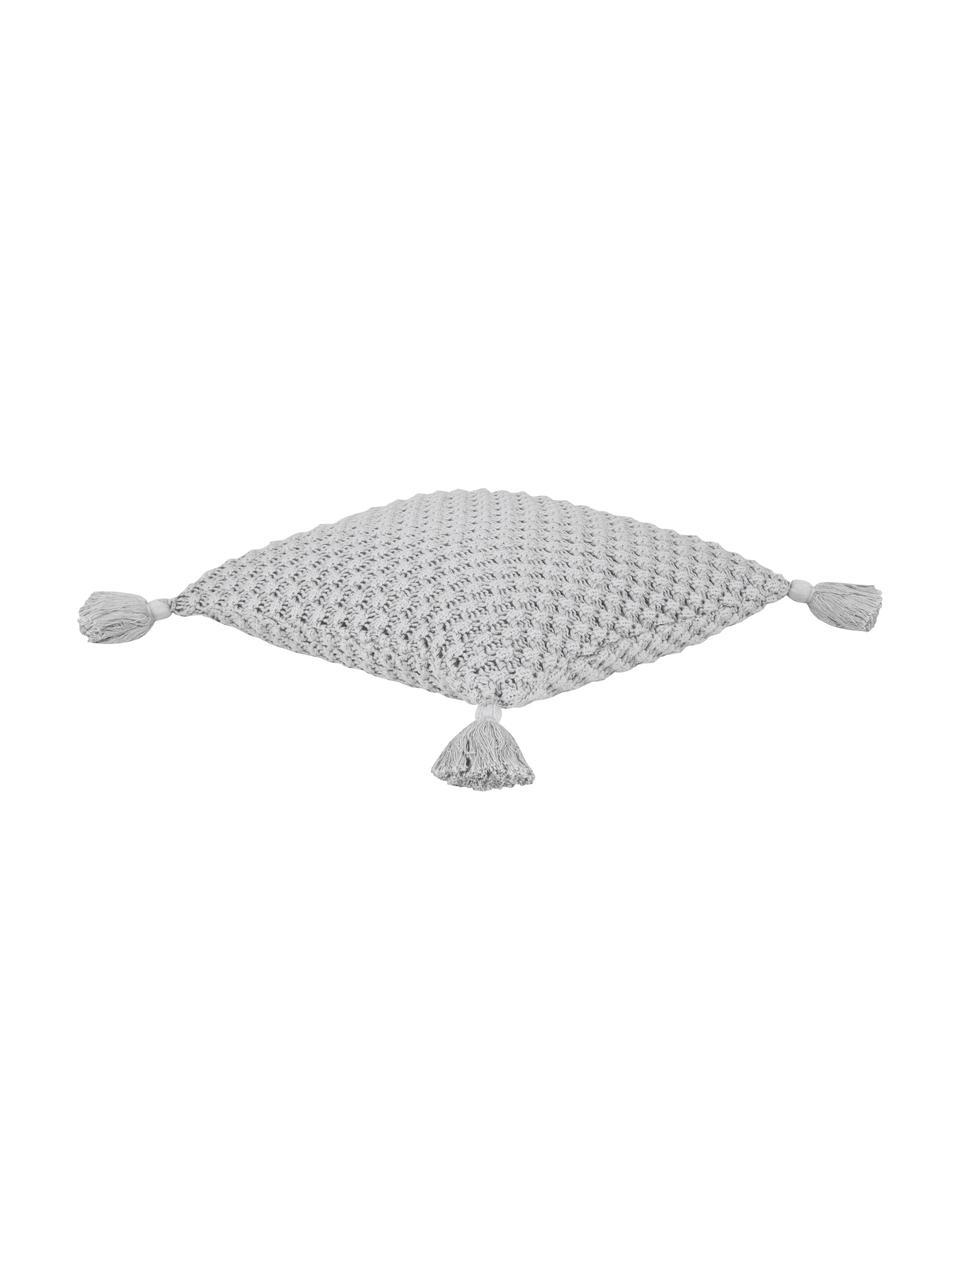 Strick-Kissenhülle Astrid mit Quasten in Grau, 100% Baumwolle, Grau, 50 x 50 cm